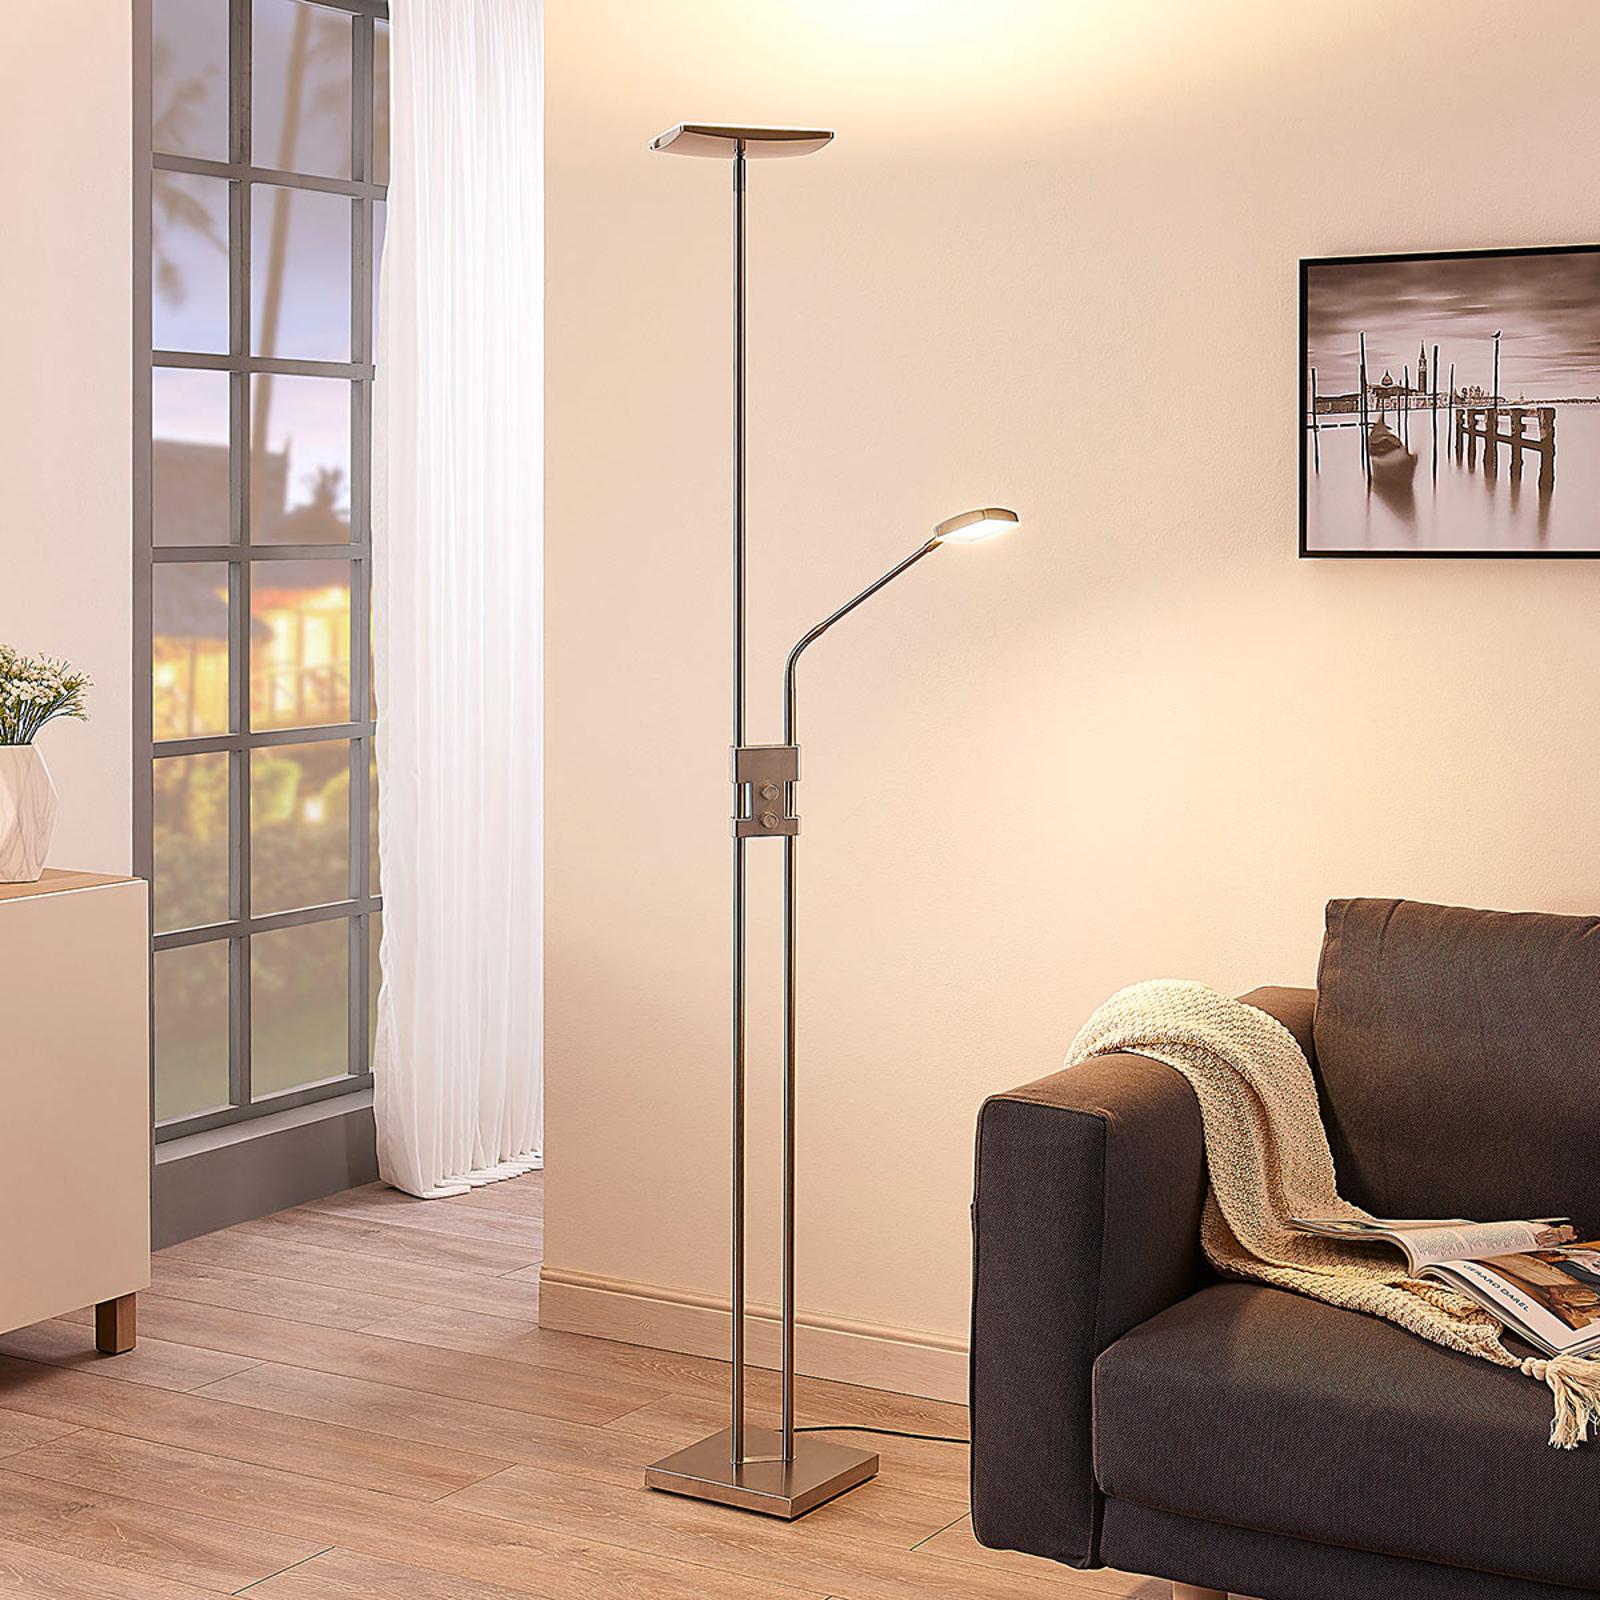 Kantig LED-uplight golvlampa Jonne, läsarm, dimbar